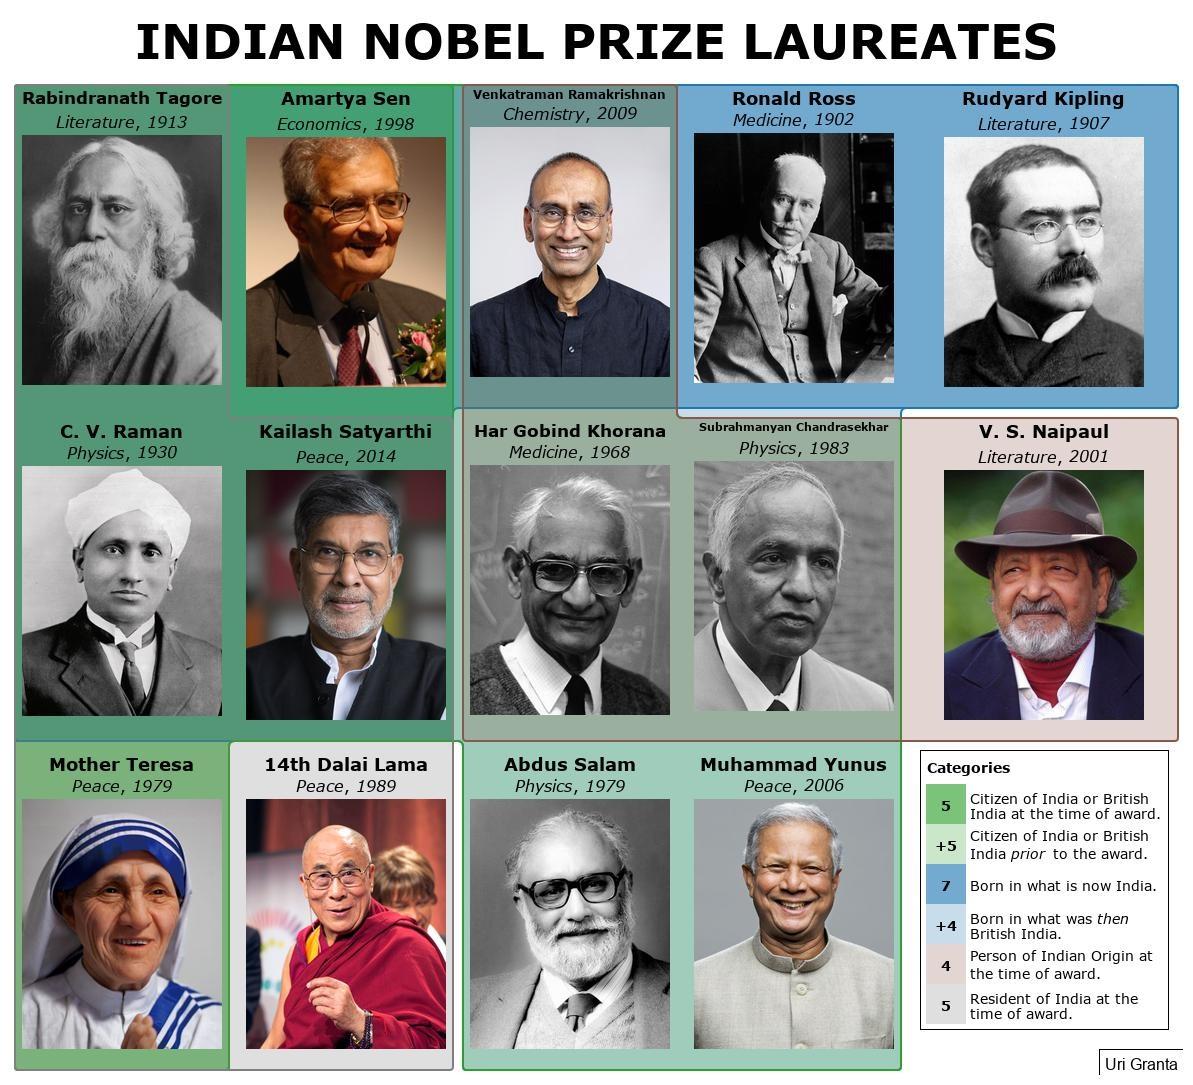 5 Laureates Were Indian Citizens At The Time Of Their Award 3 Republic India Teresa Sen Satyarthi And 2 British